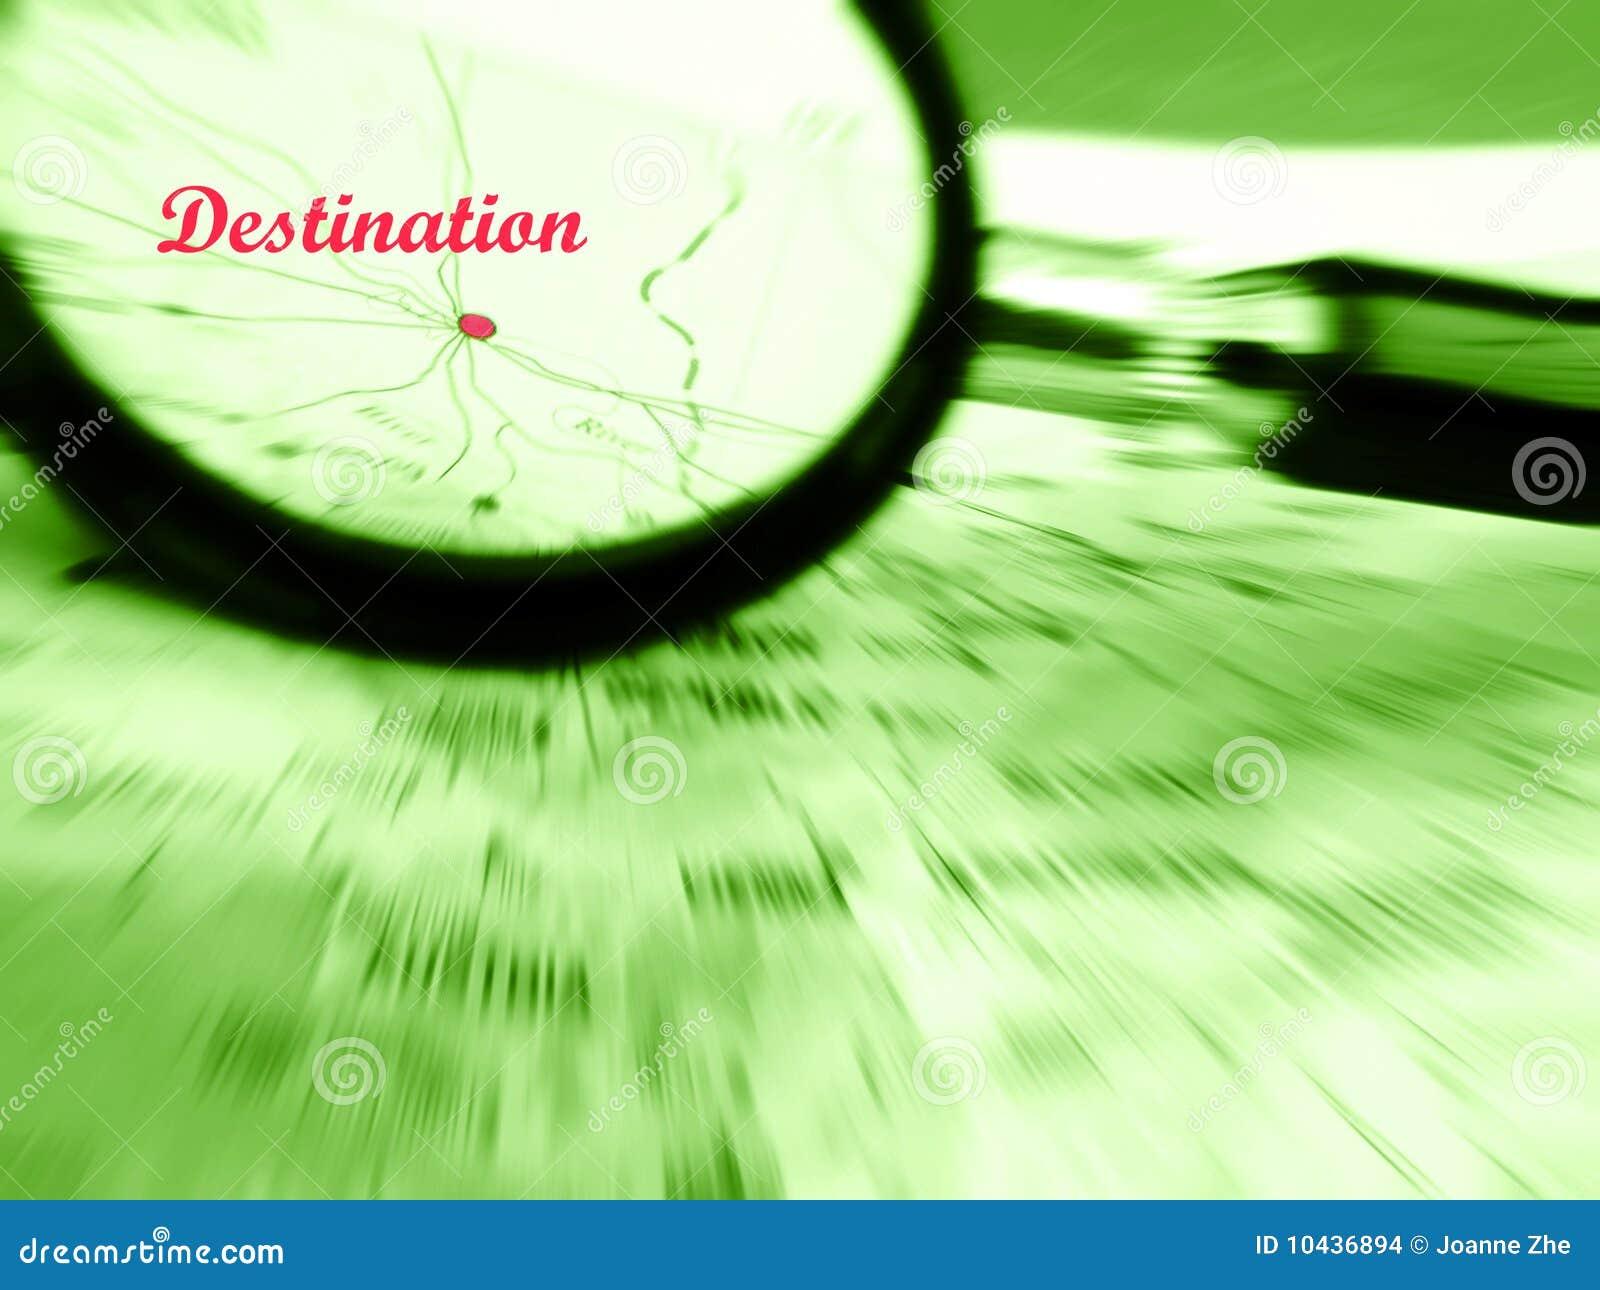 Focus on destination